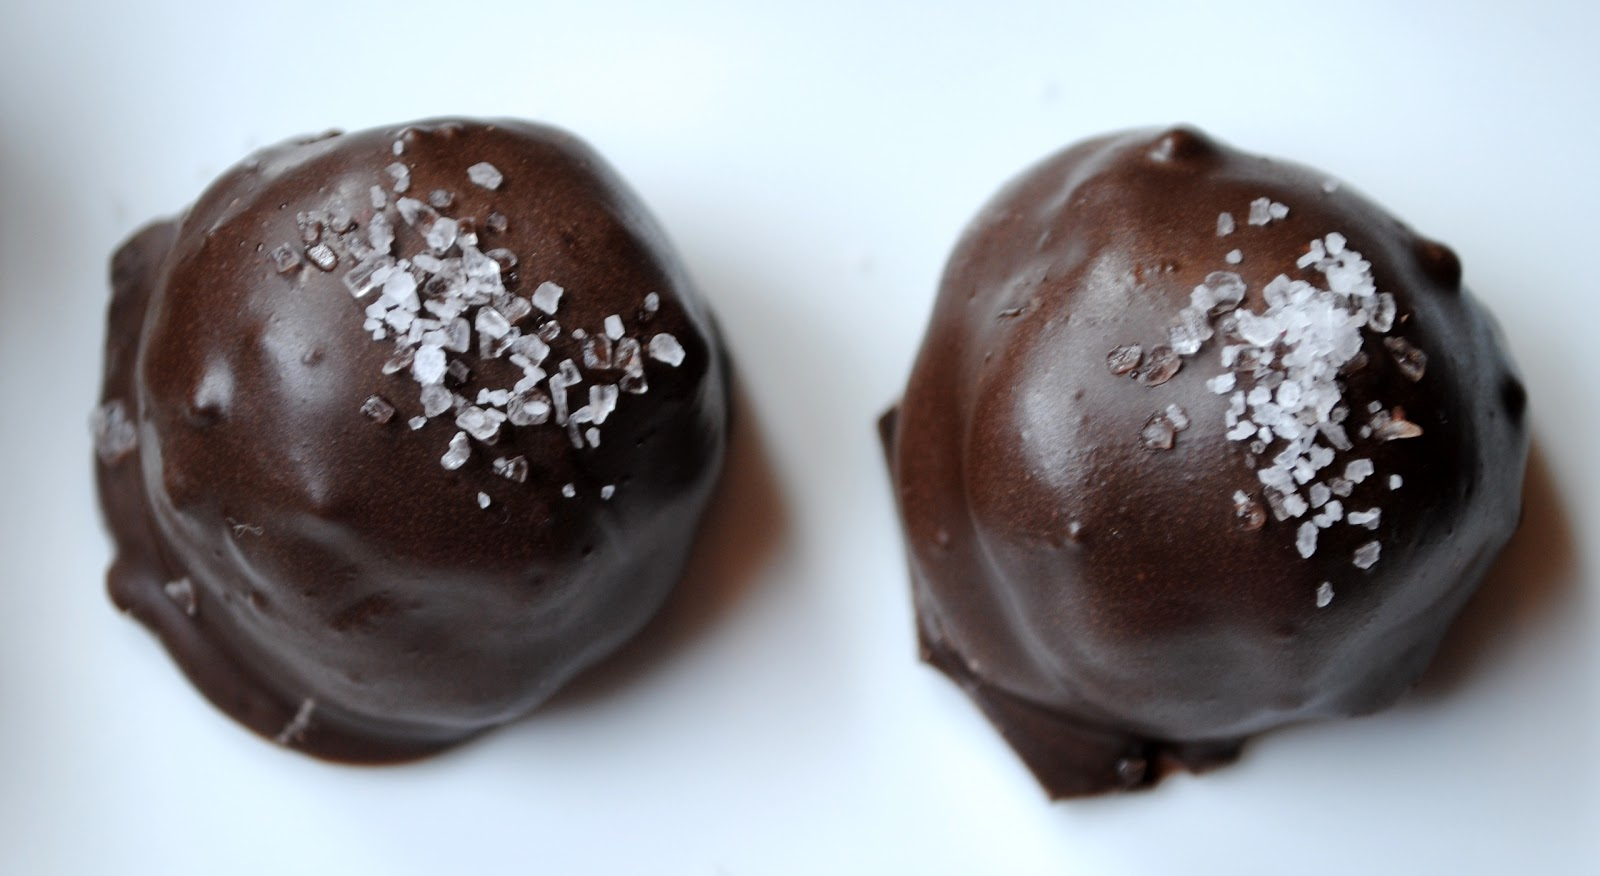 ... chocolate truffles chocolate truffles with sea chocolate and sea salt